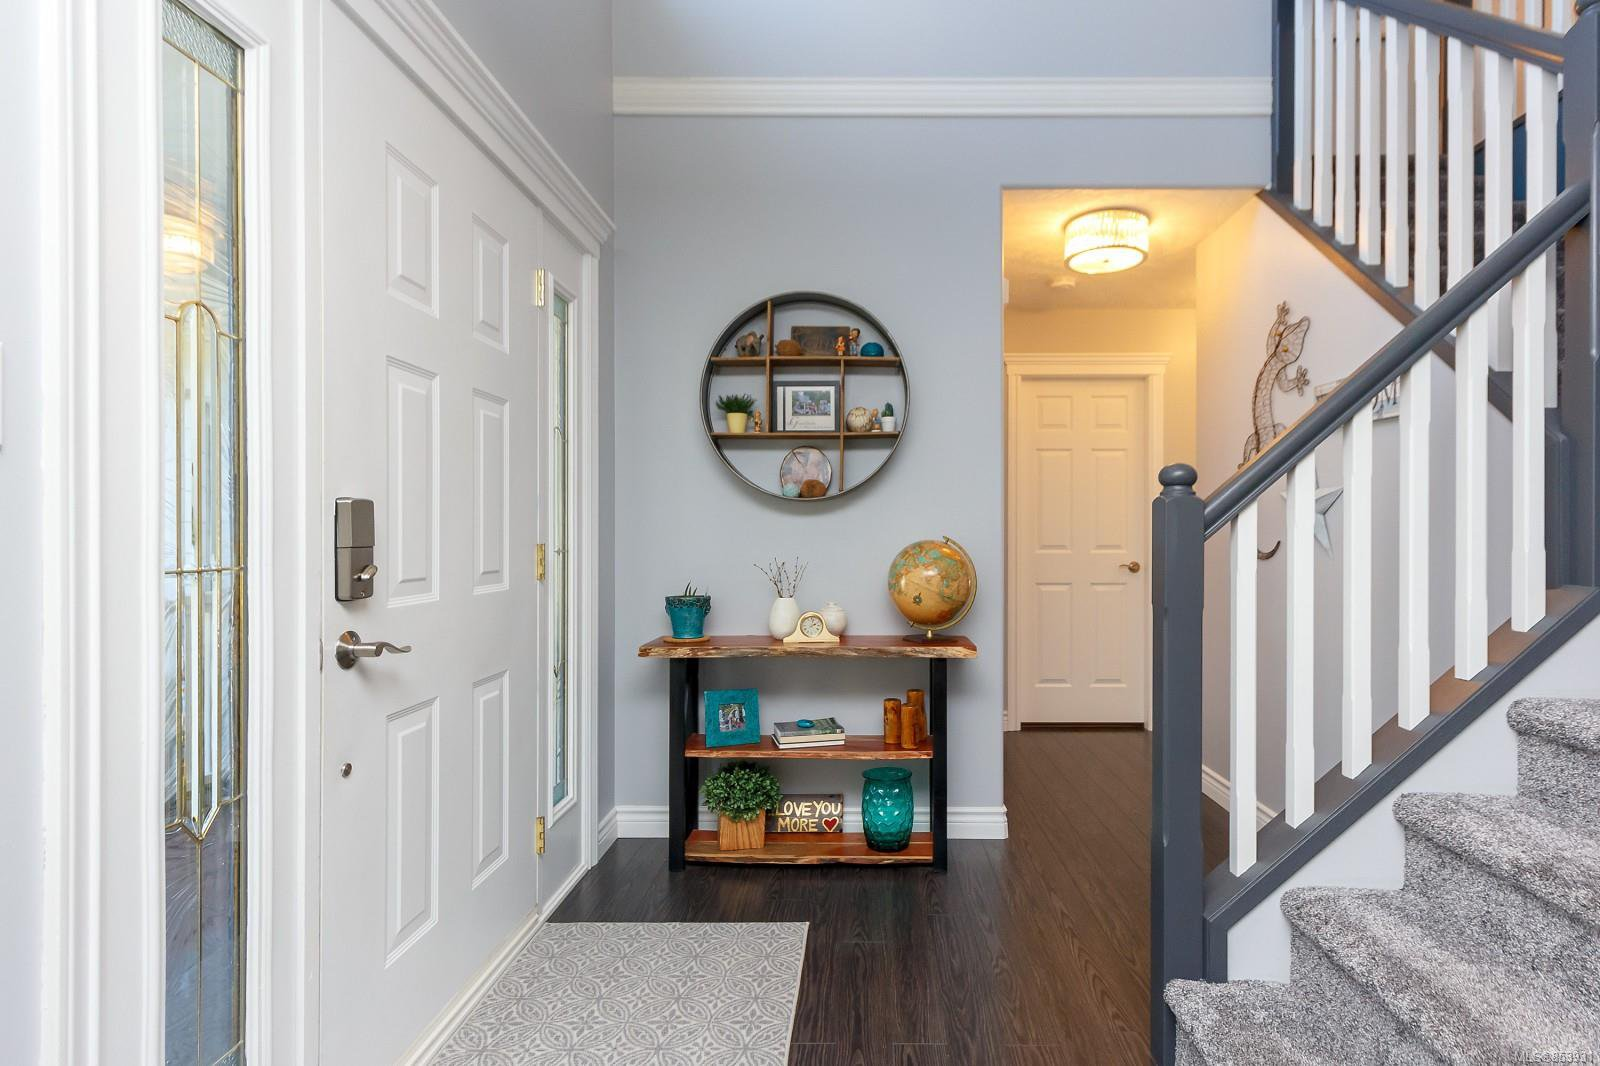 Photo 3: Photos: 2456 Timbercrest Dr in : Du East Duncan House for sale (Duncan)  : MLS®# 853931